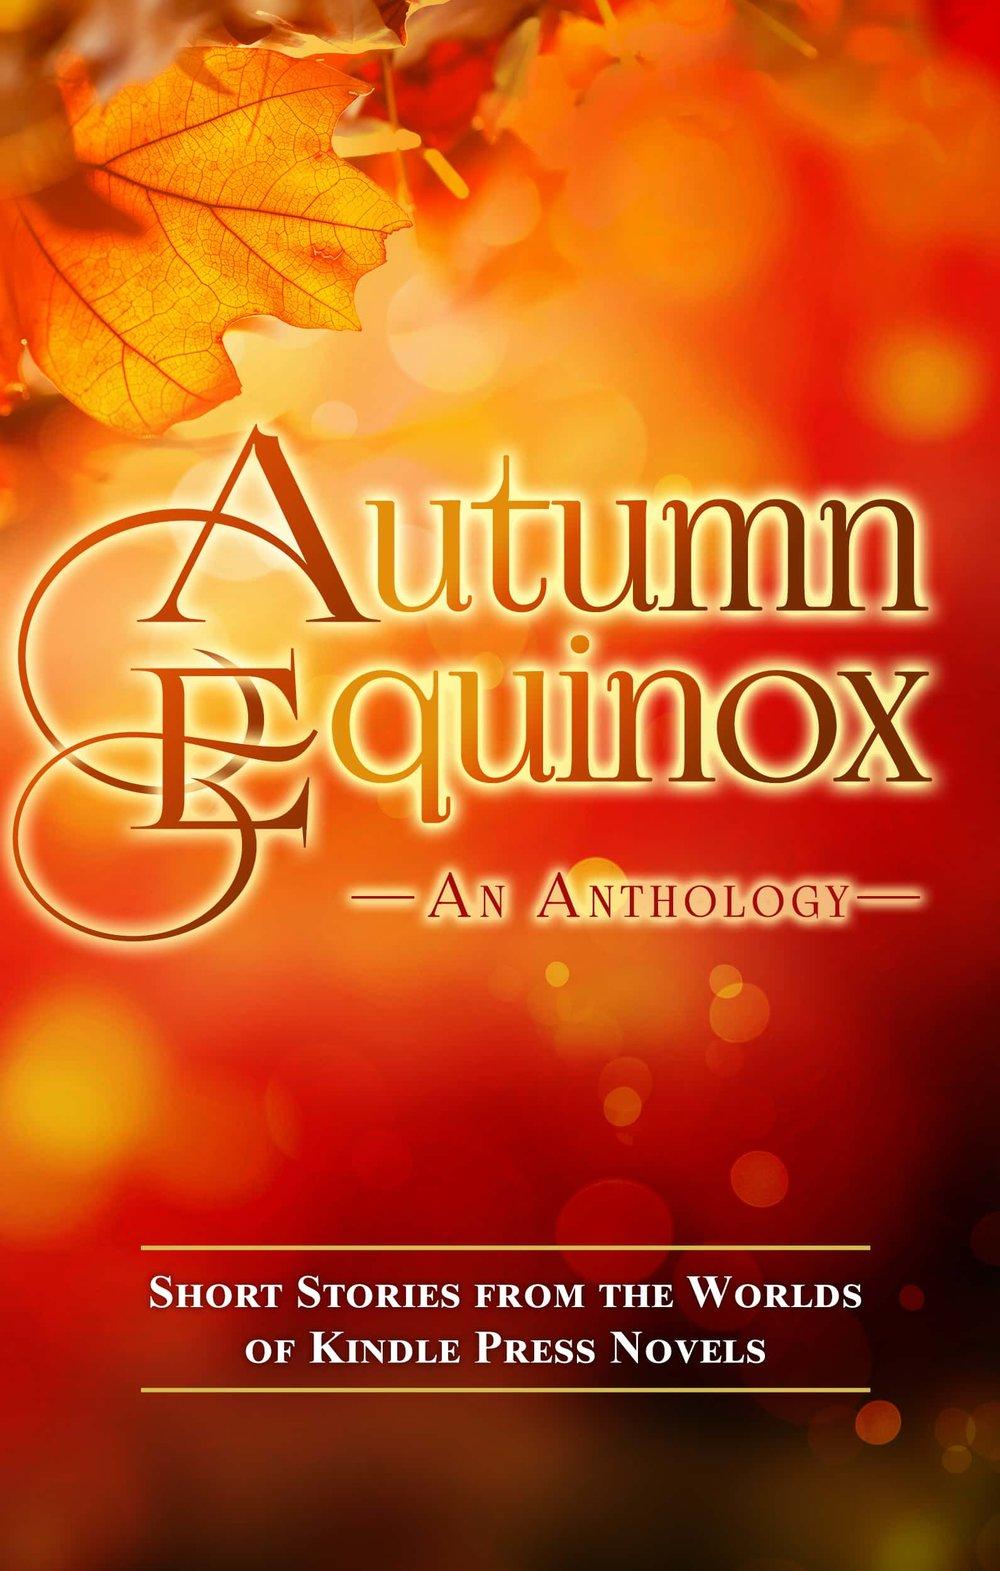 Autumn Equinox Landing Page E-Book Cover